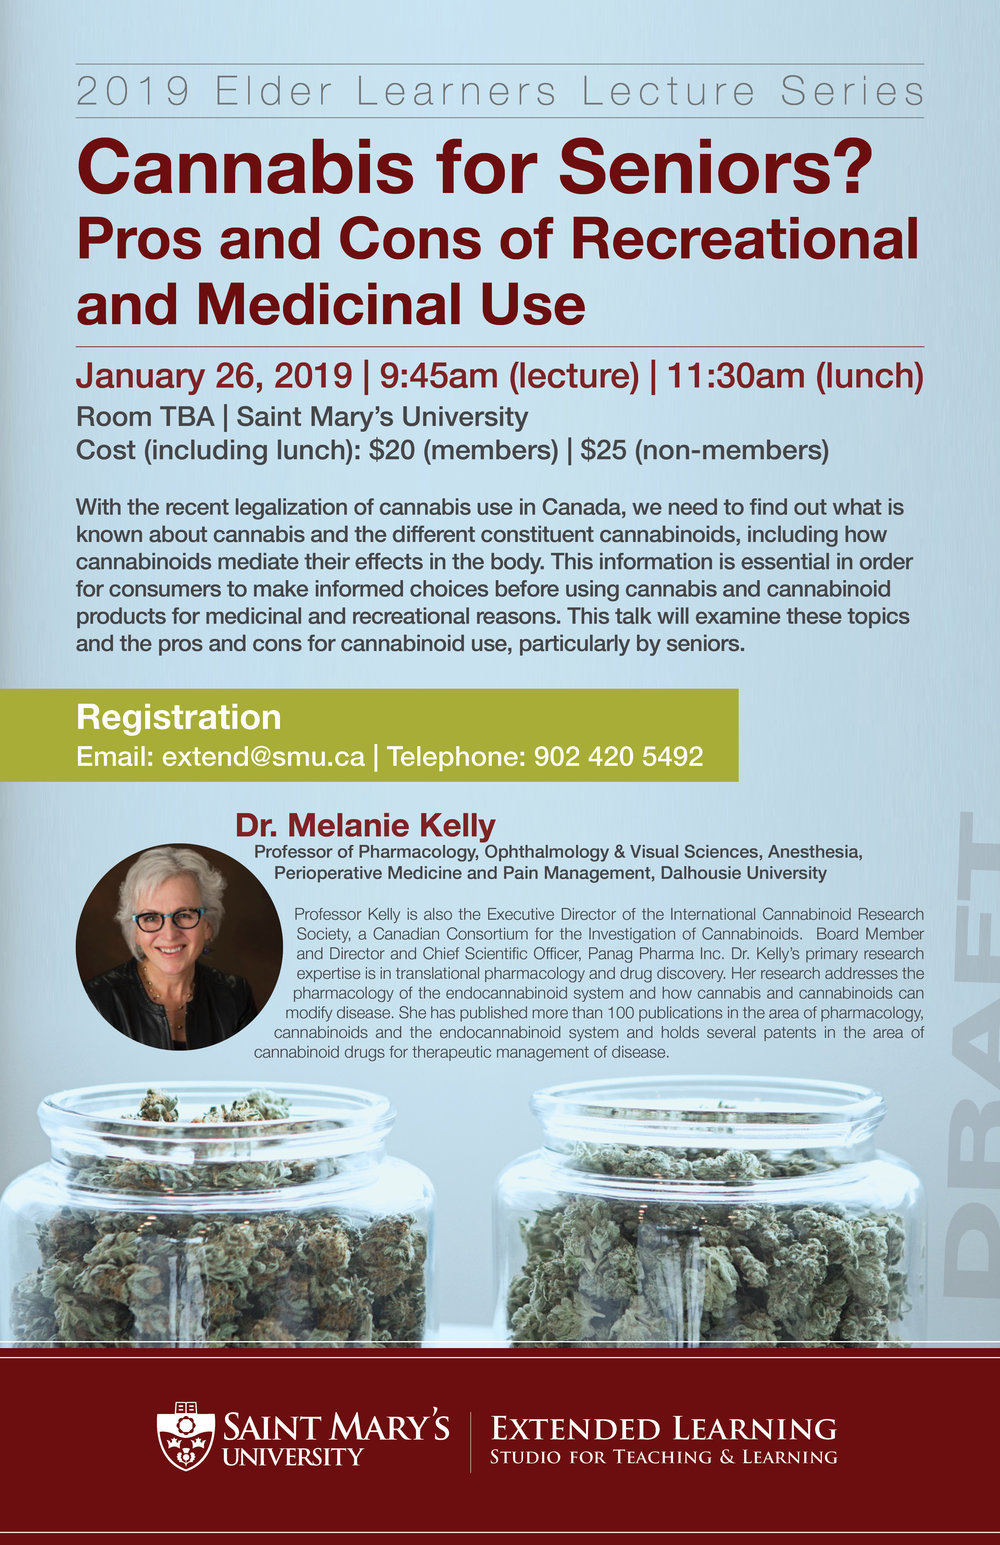 Cannabis for Seniors poster